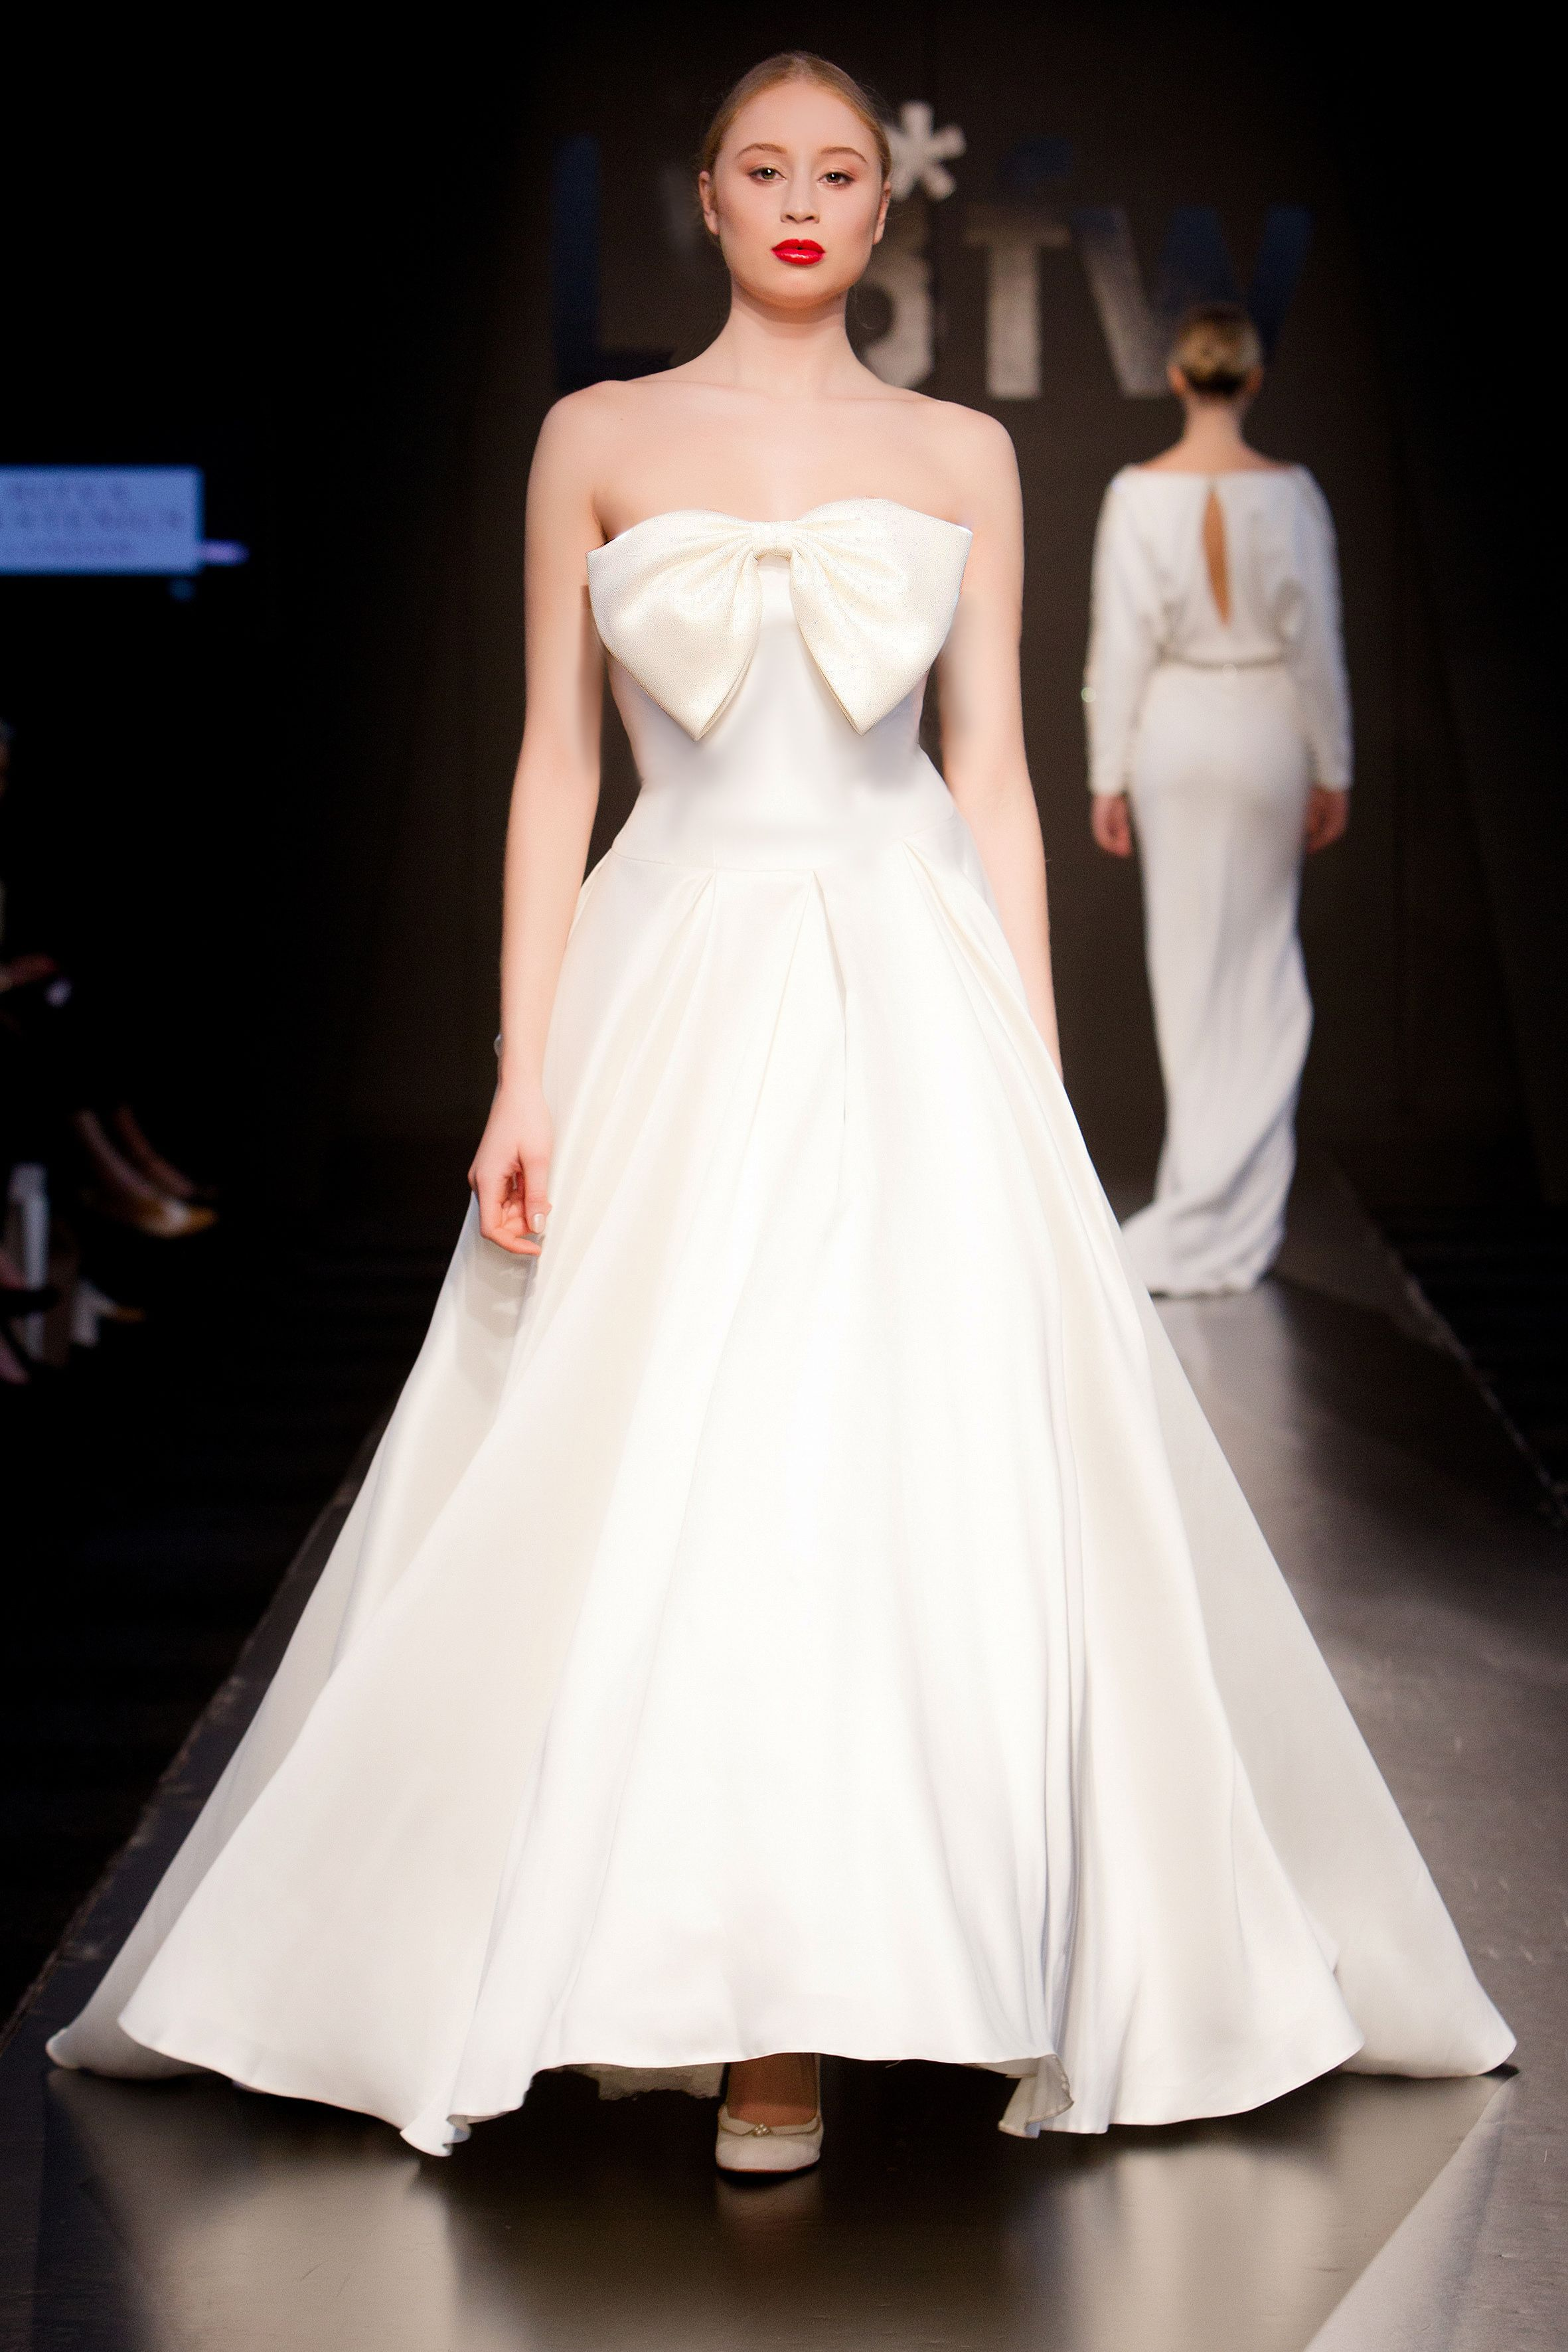 Cara mia bow wedding dress by ritva westenius lbfw bow